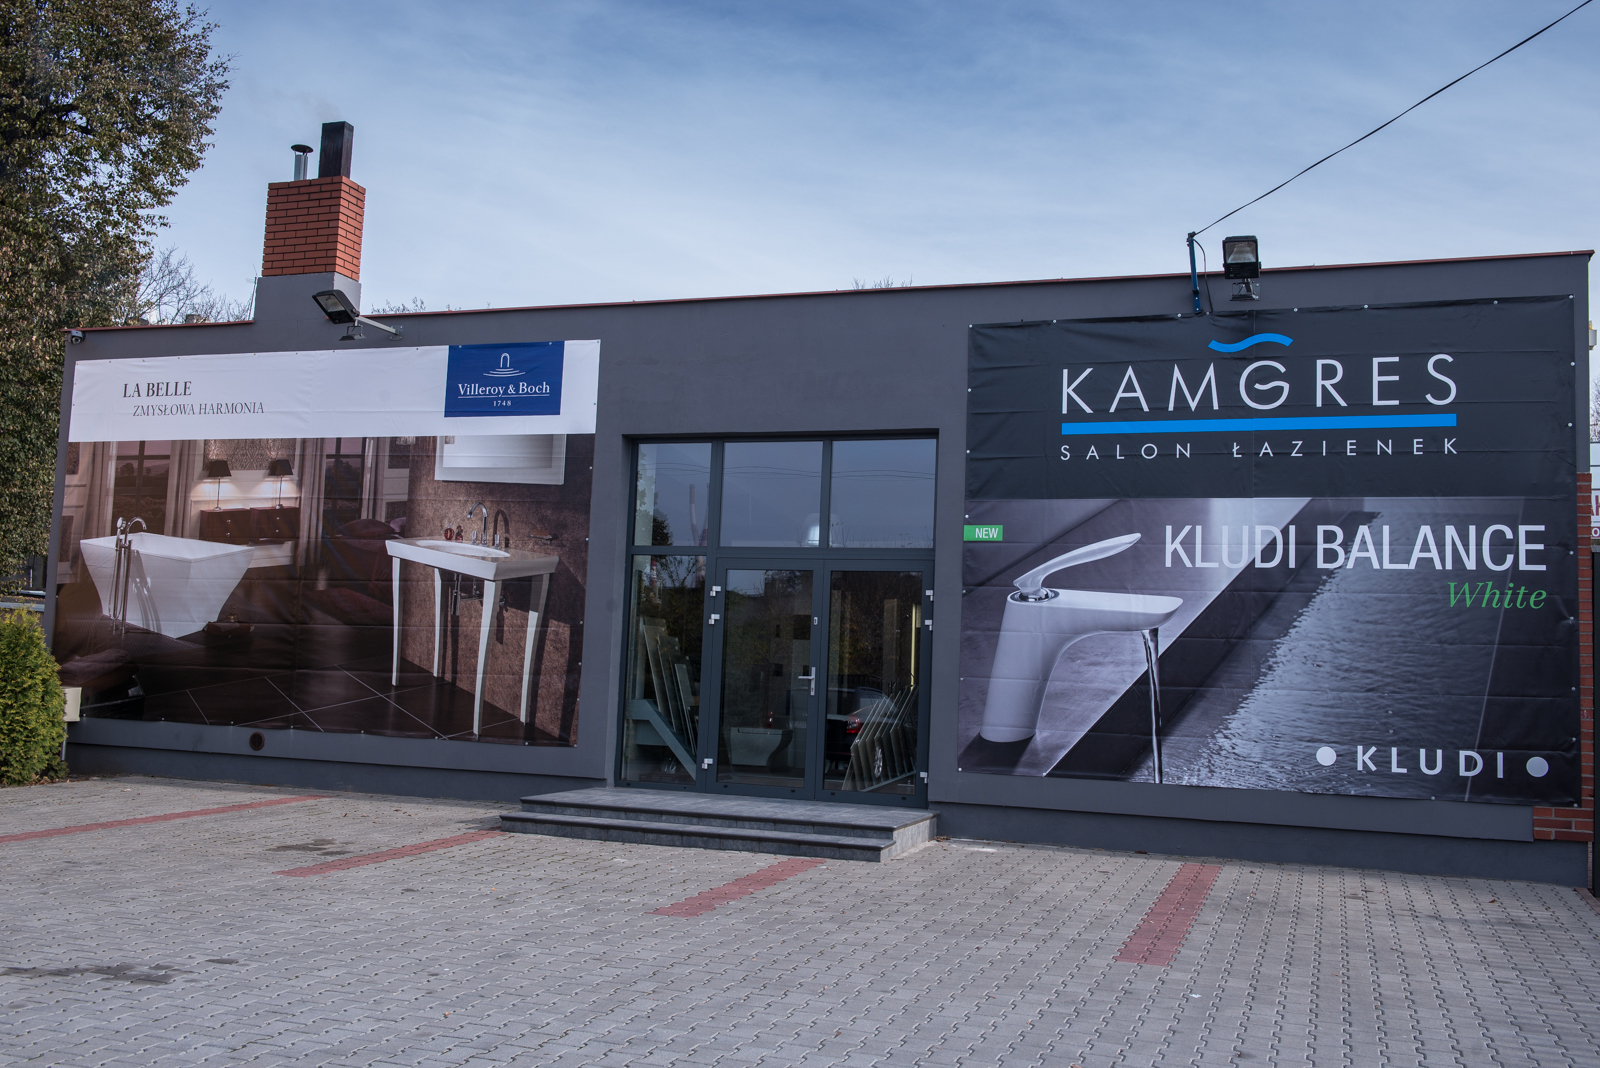 Salon Łazienek Kamgres | Łódź